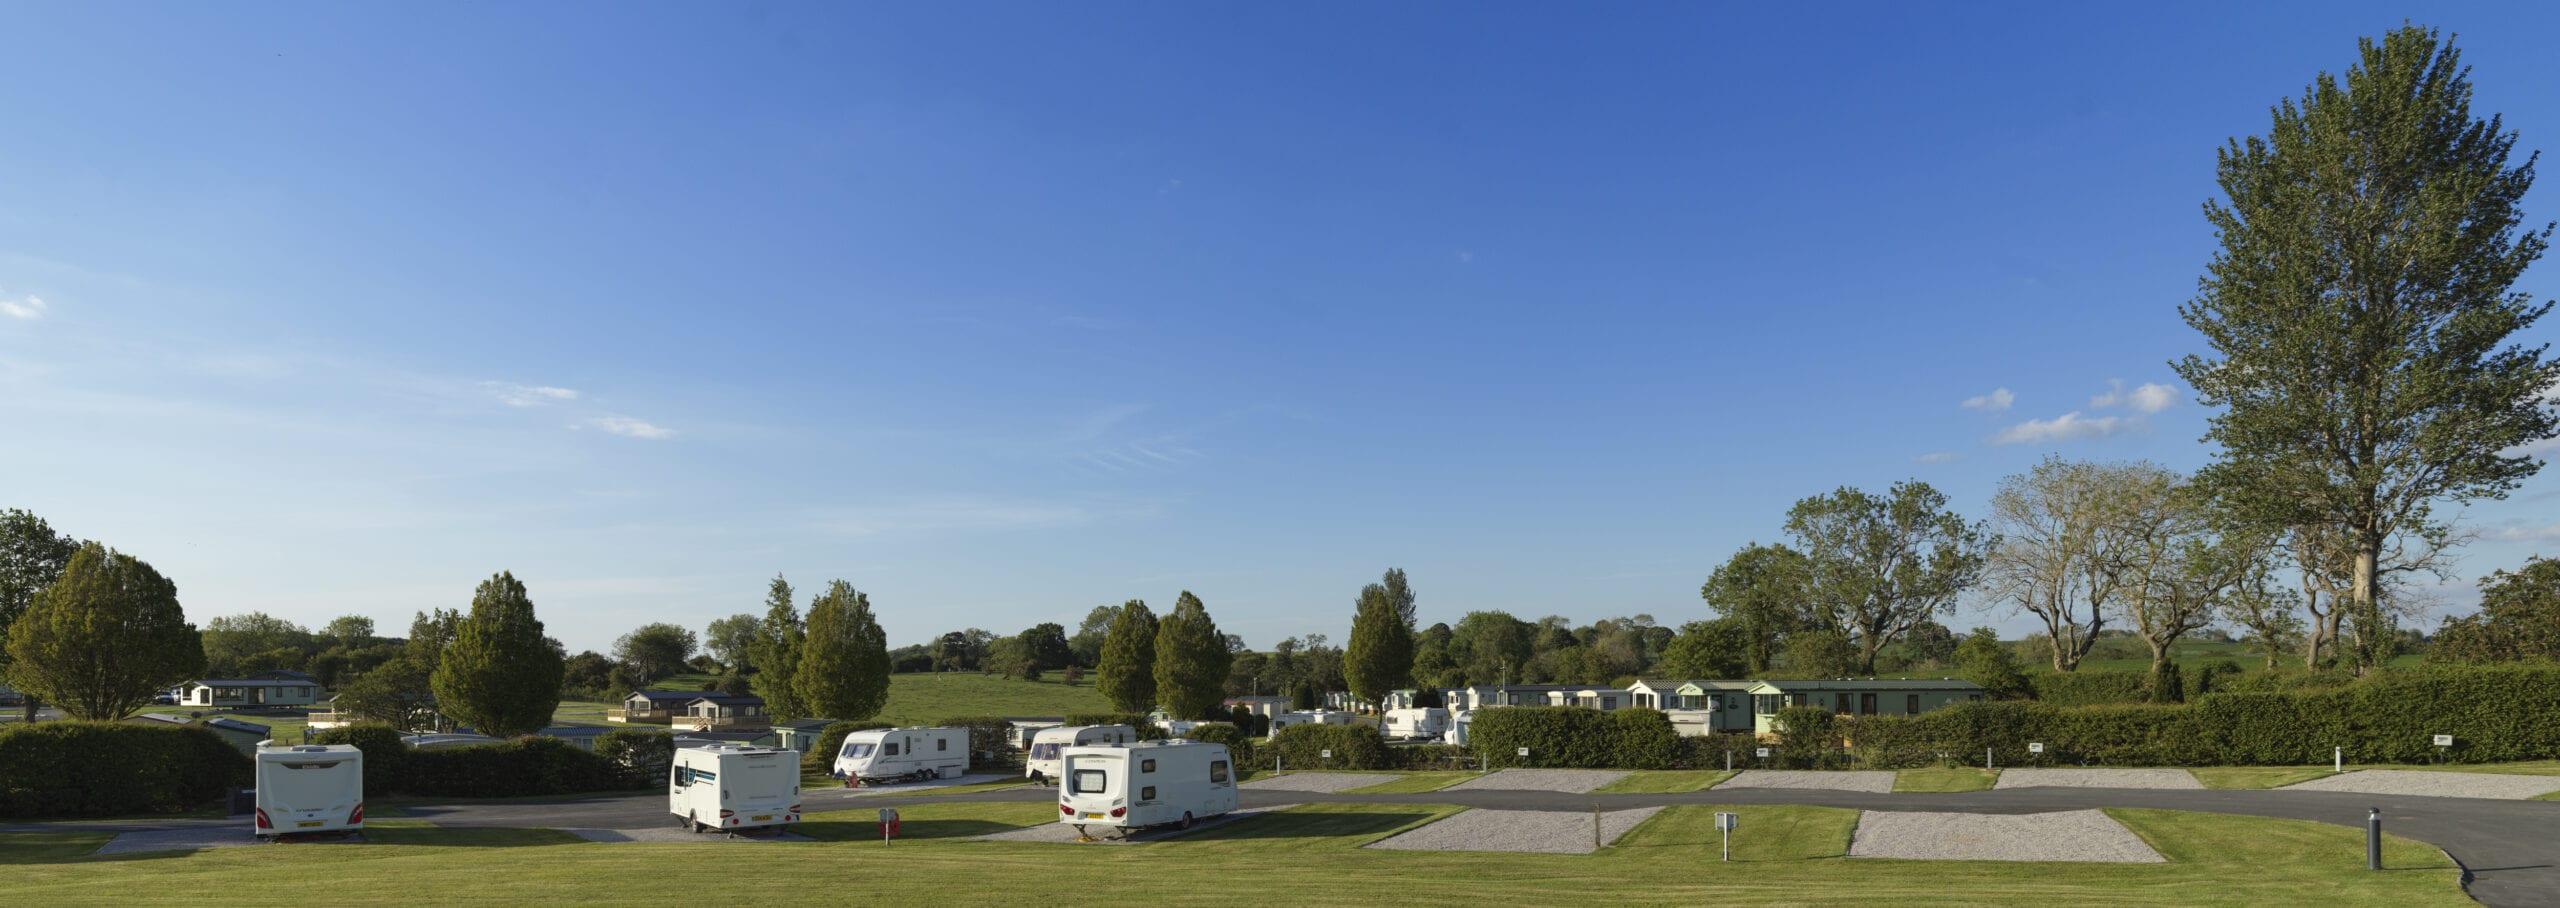 Ribble Valley touring holiday park - Holgates